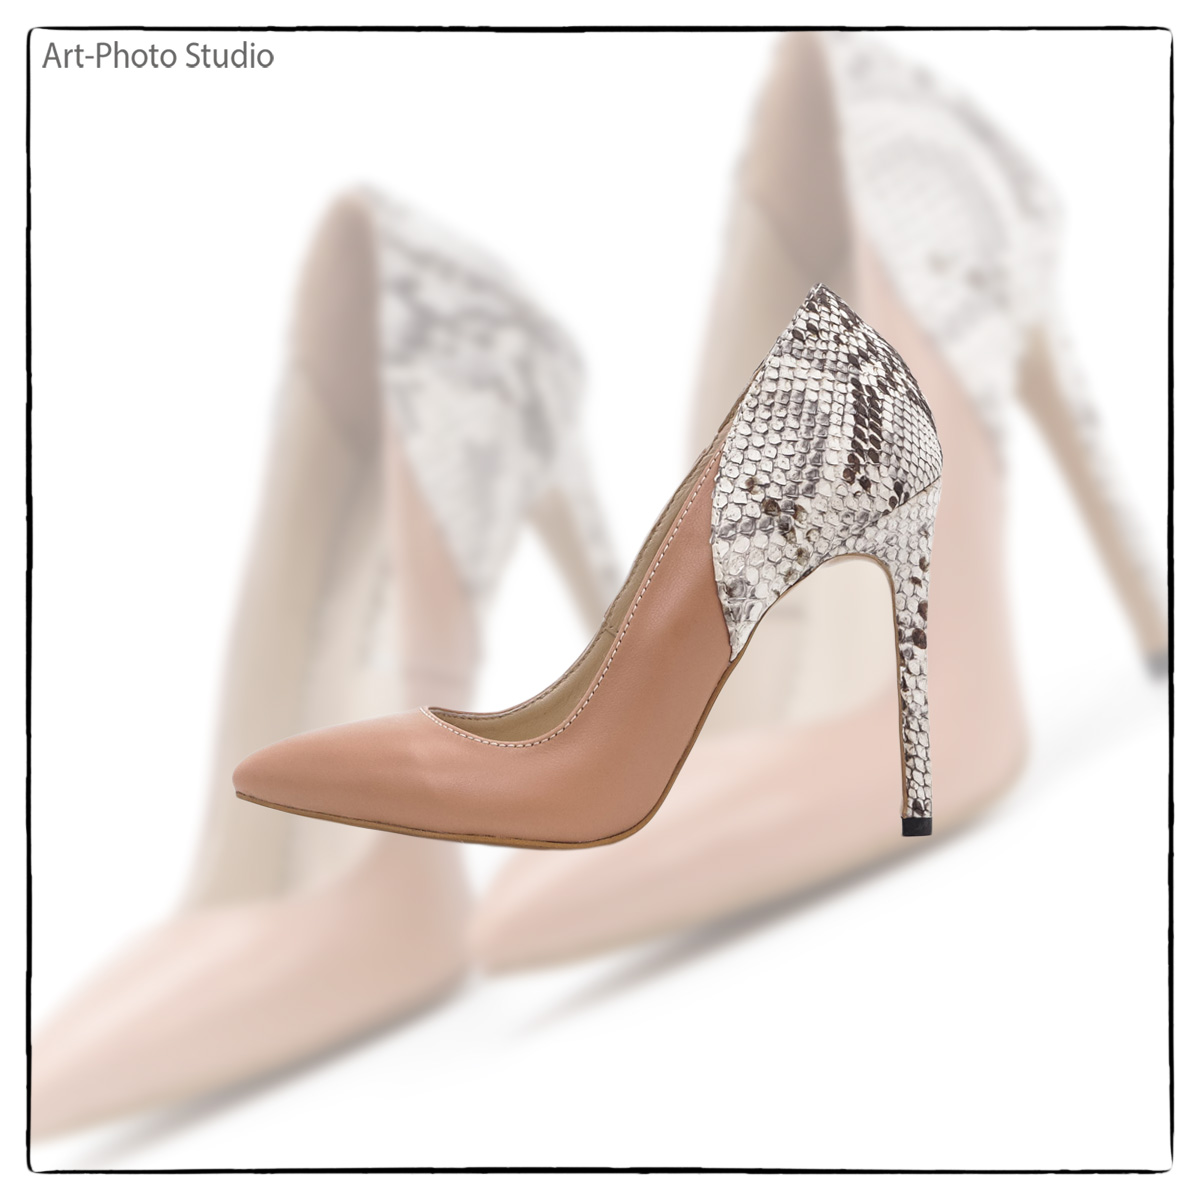 фото обуви для рекламы